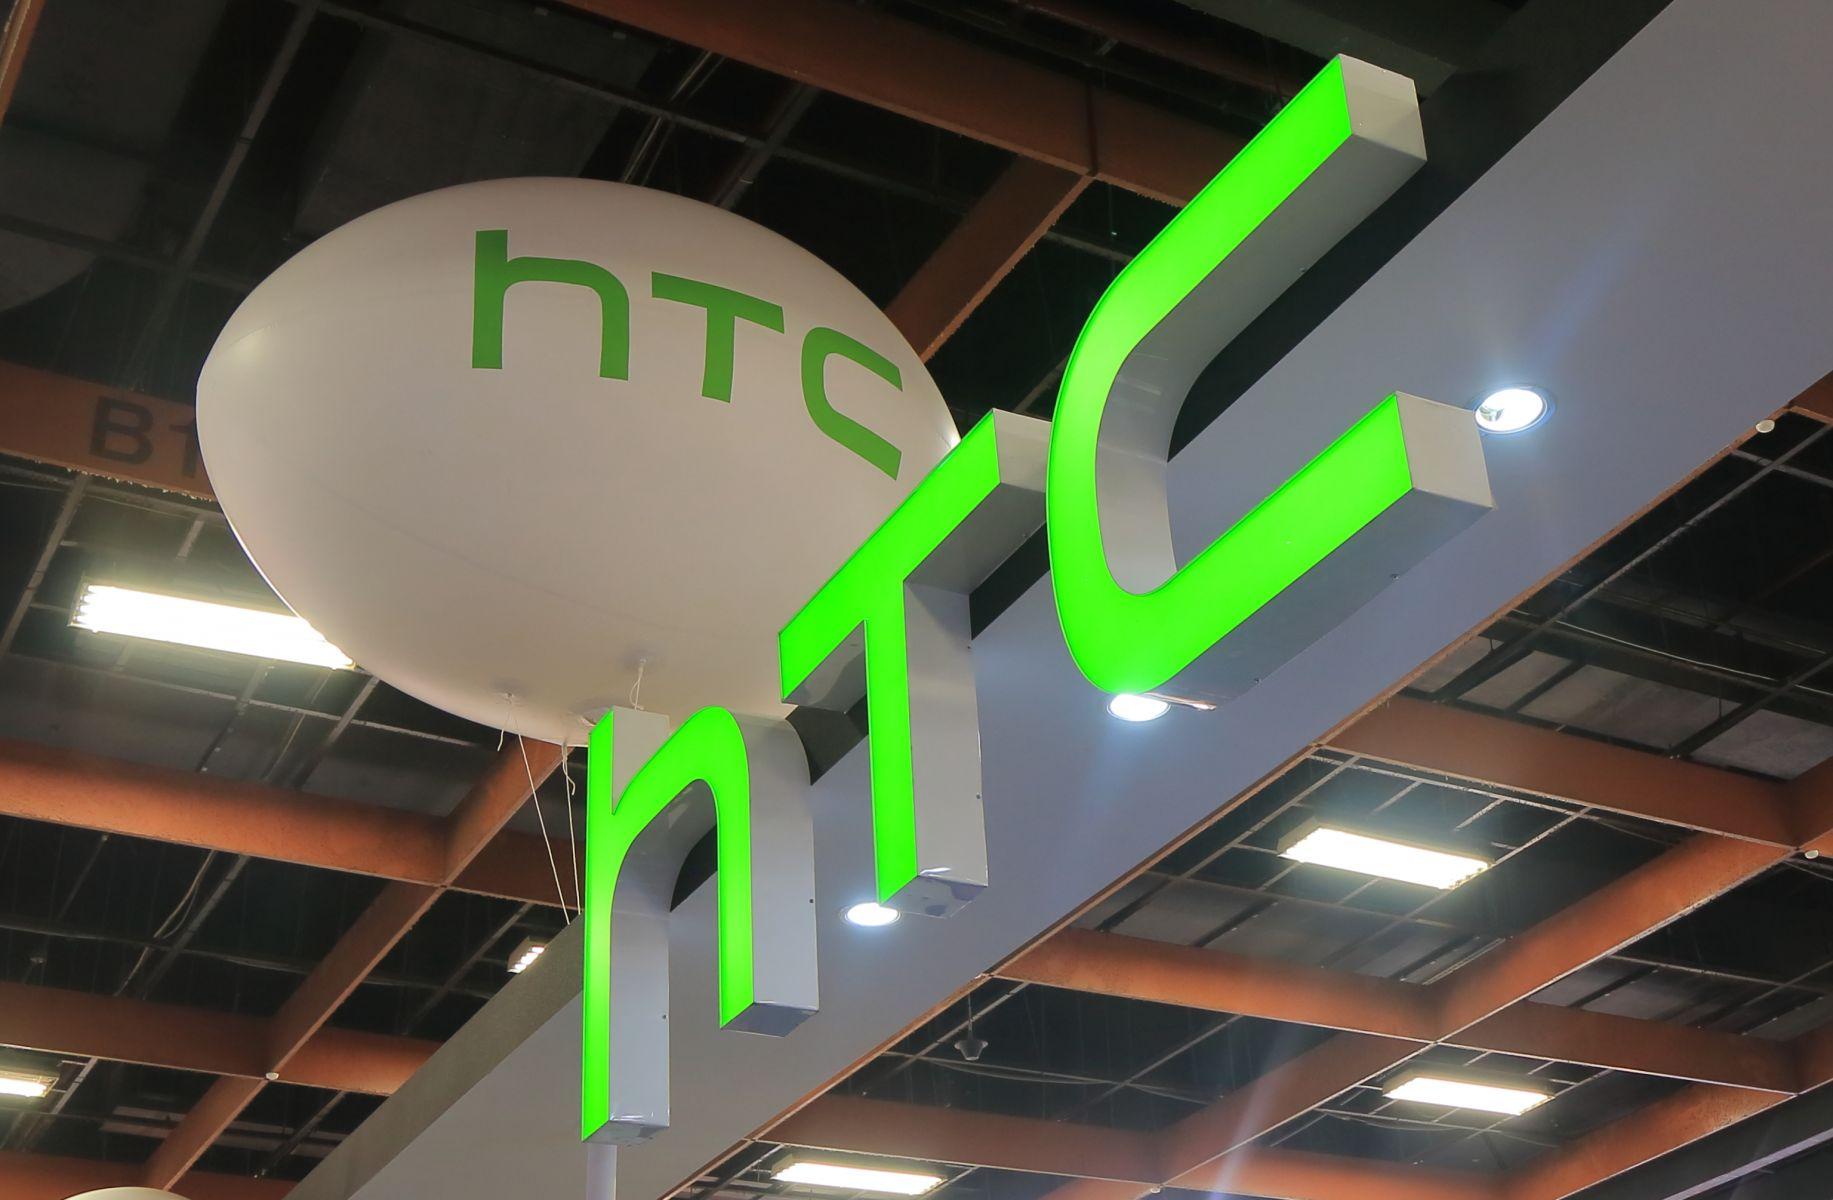 HTC崩壞倒數計時? 智慧機慘銷...捧新星卻驚見黑洞